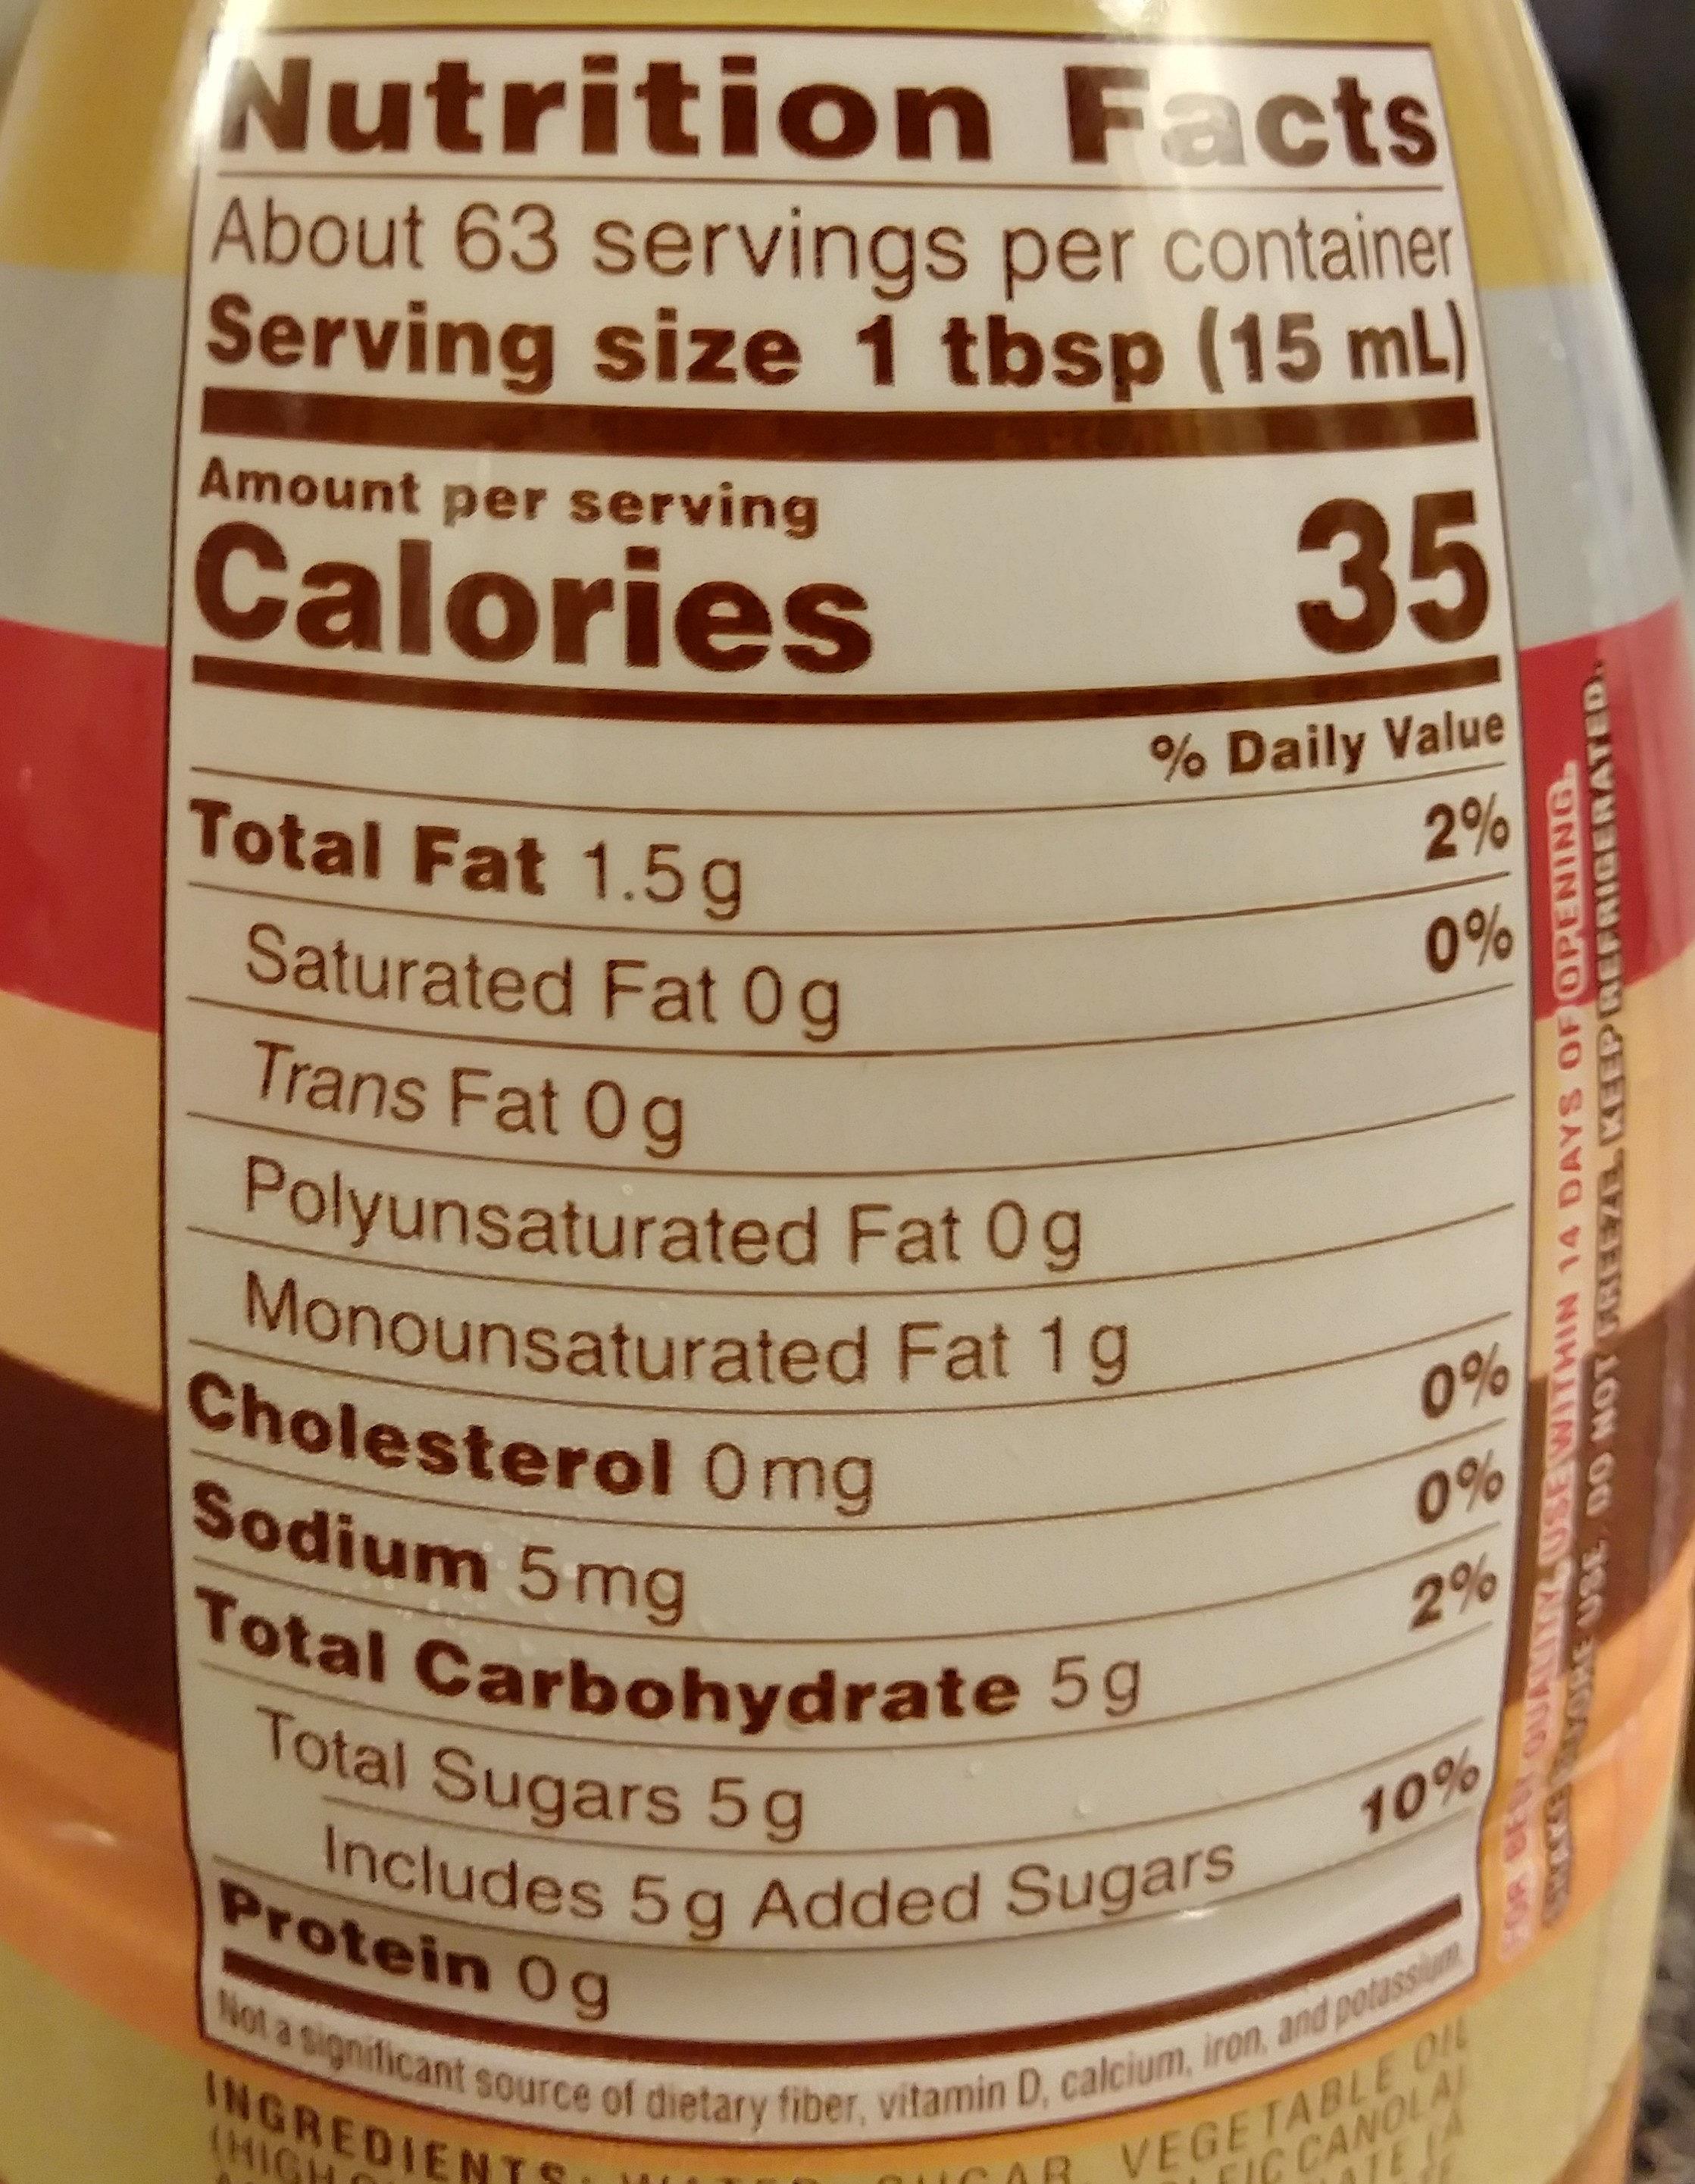 Coffee-mate Dulce de Leche - Nutrition facts